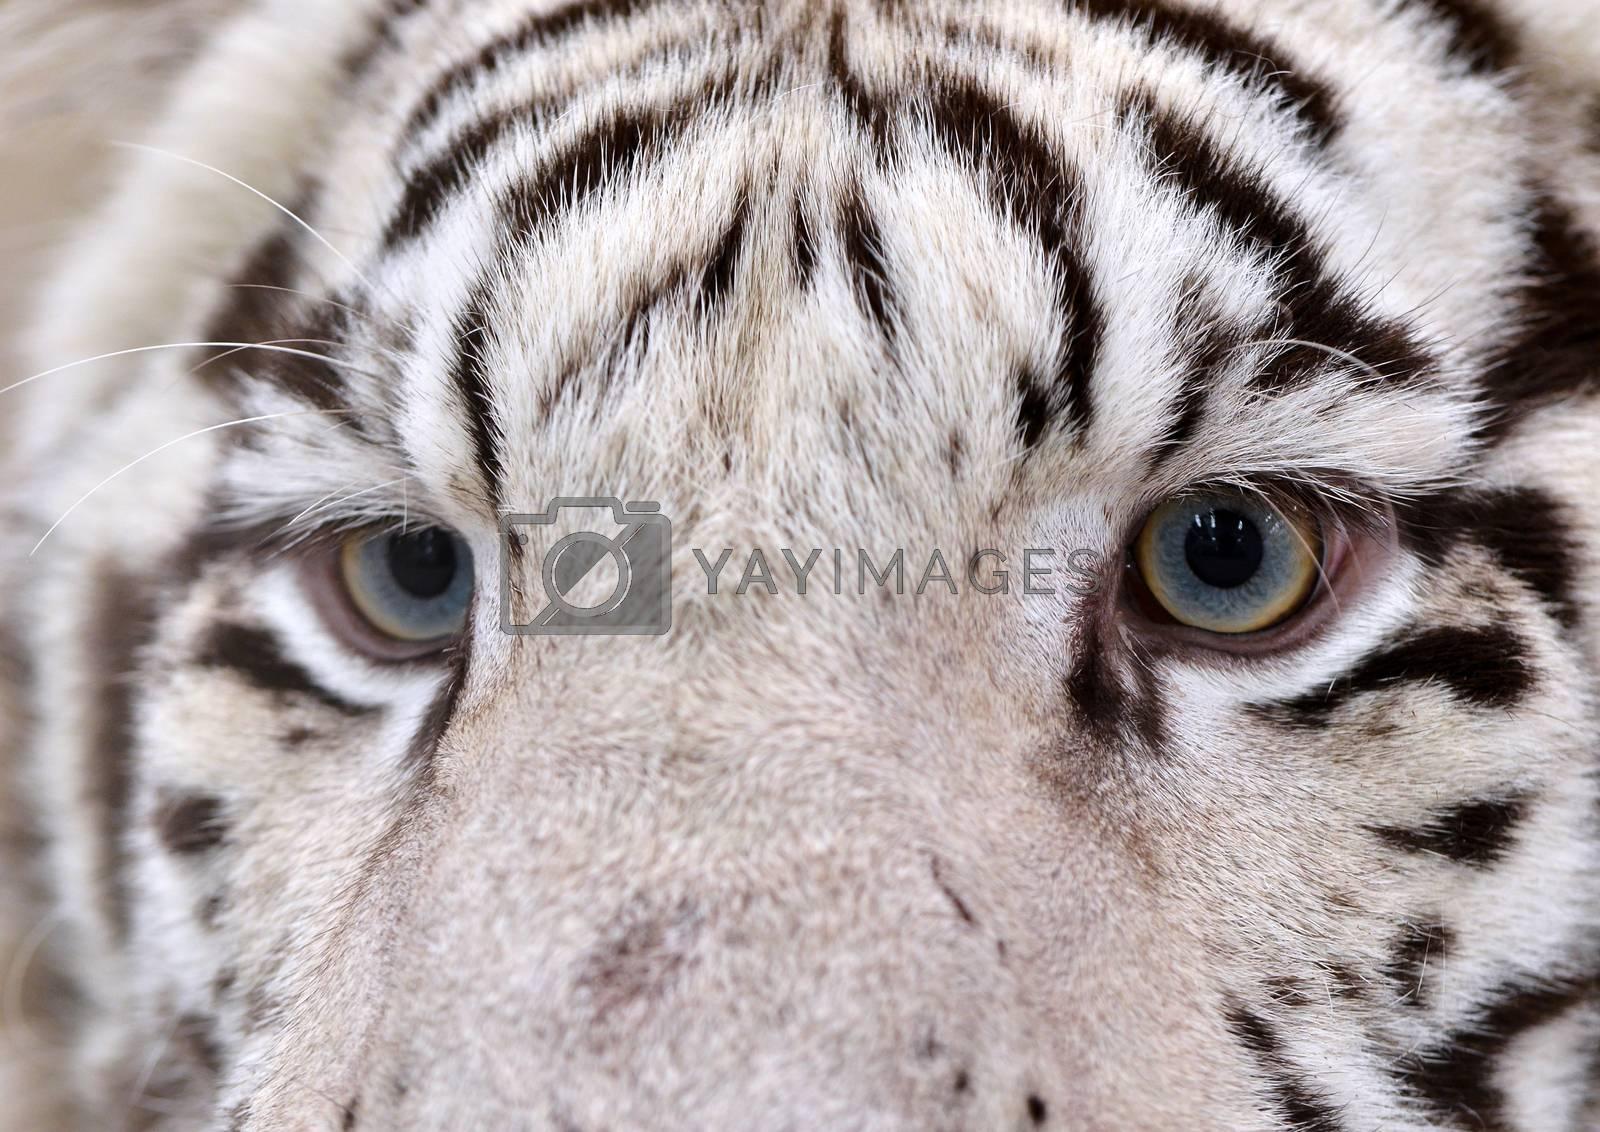 Royalty free image of white bengal tiger eyes by anankkml